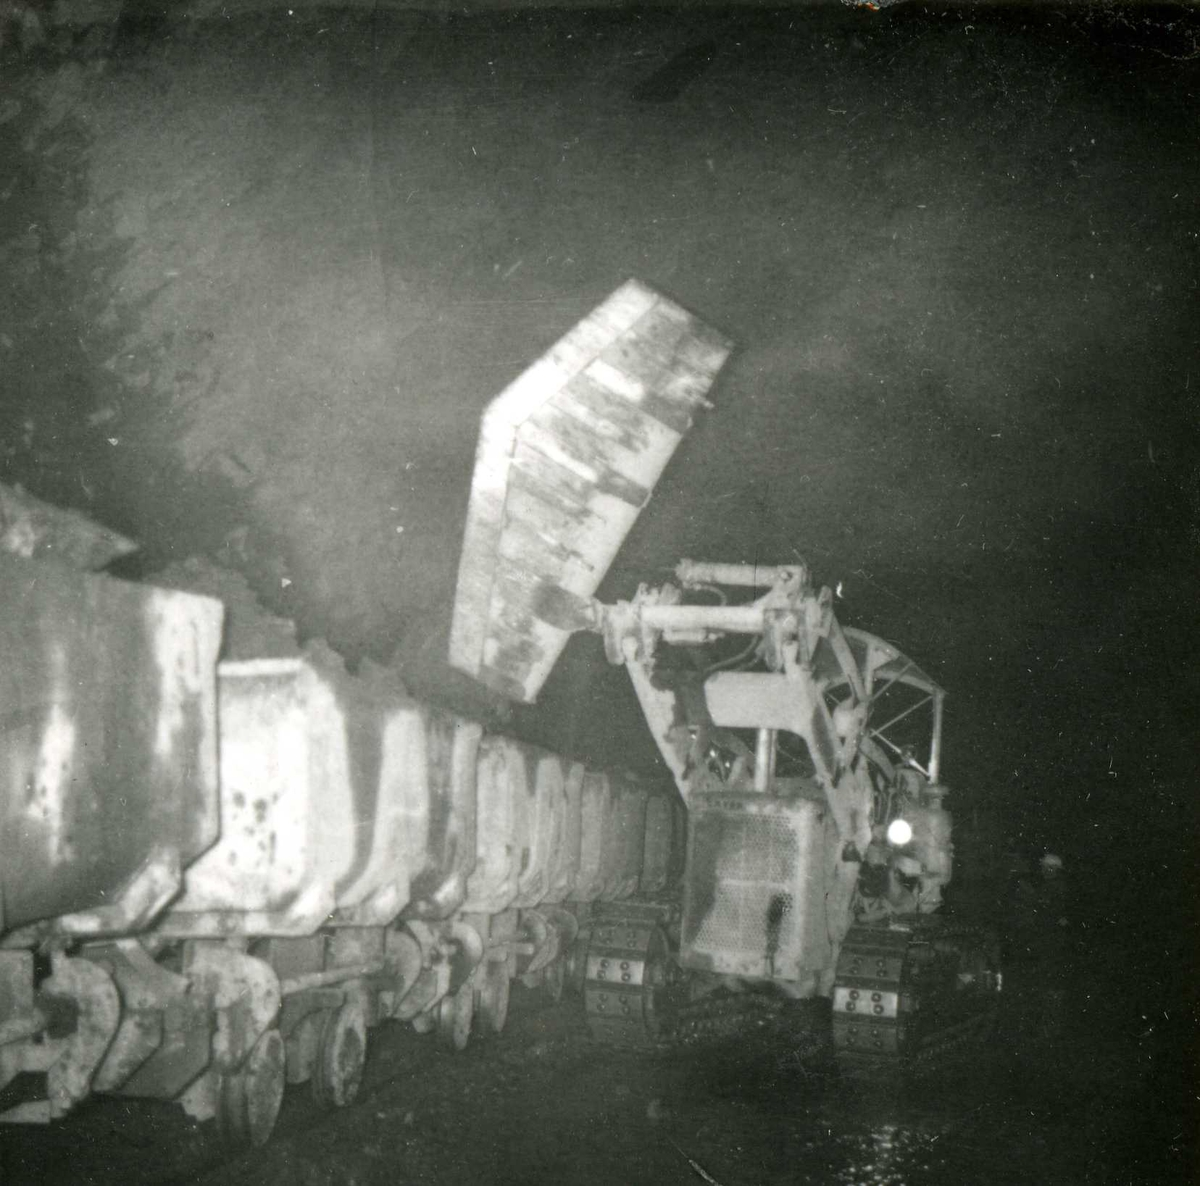 Tilløpstunnel frå Vesås. Maskinarbeid i tunnel.